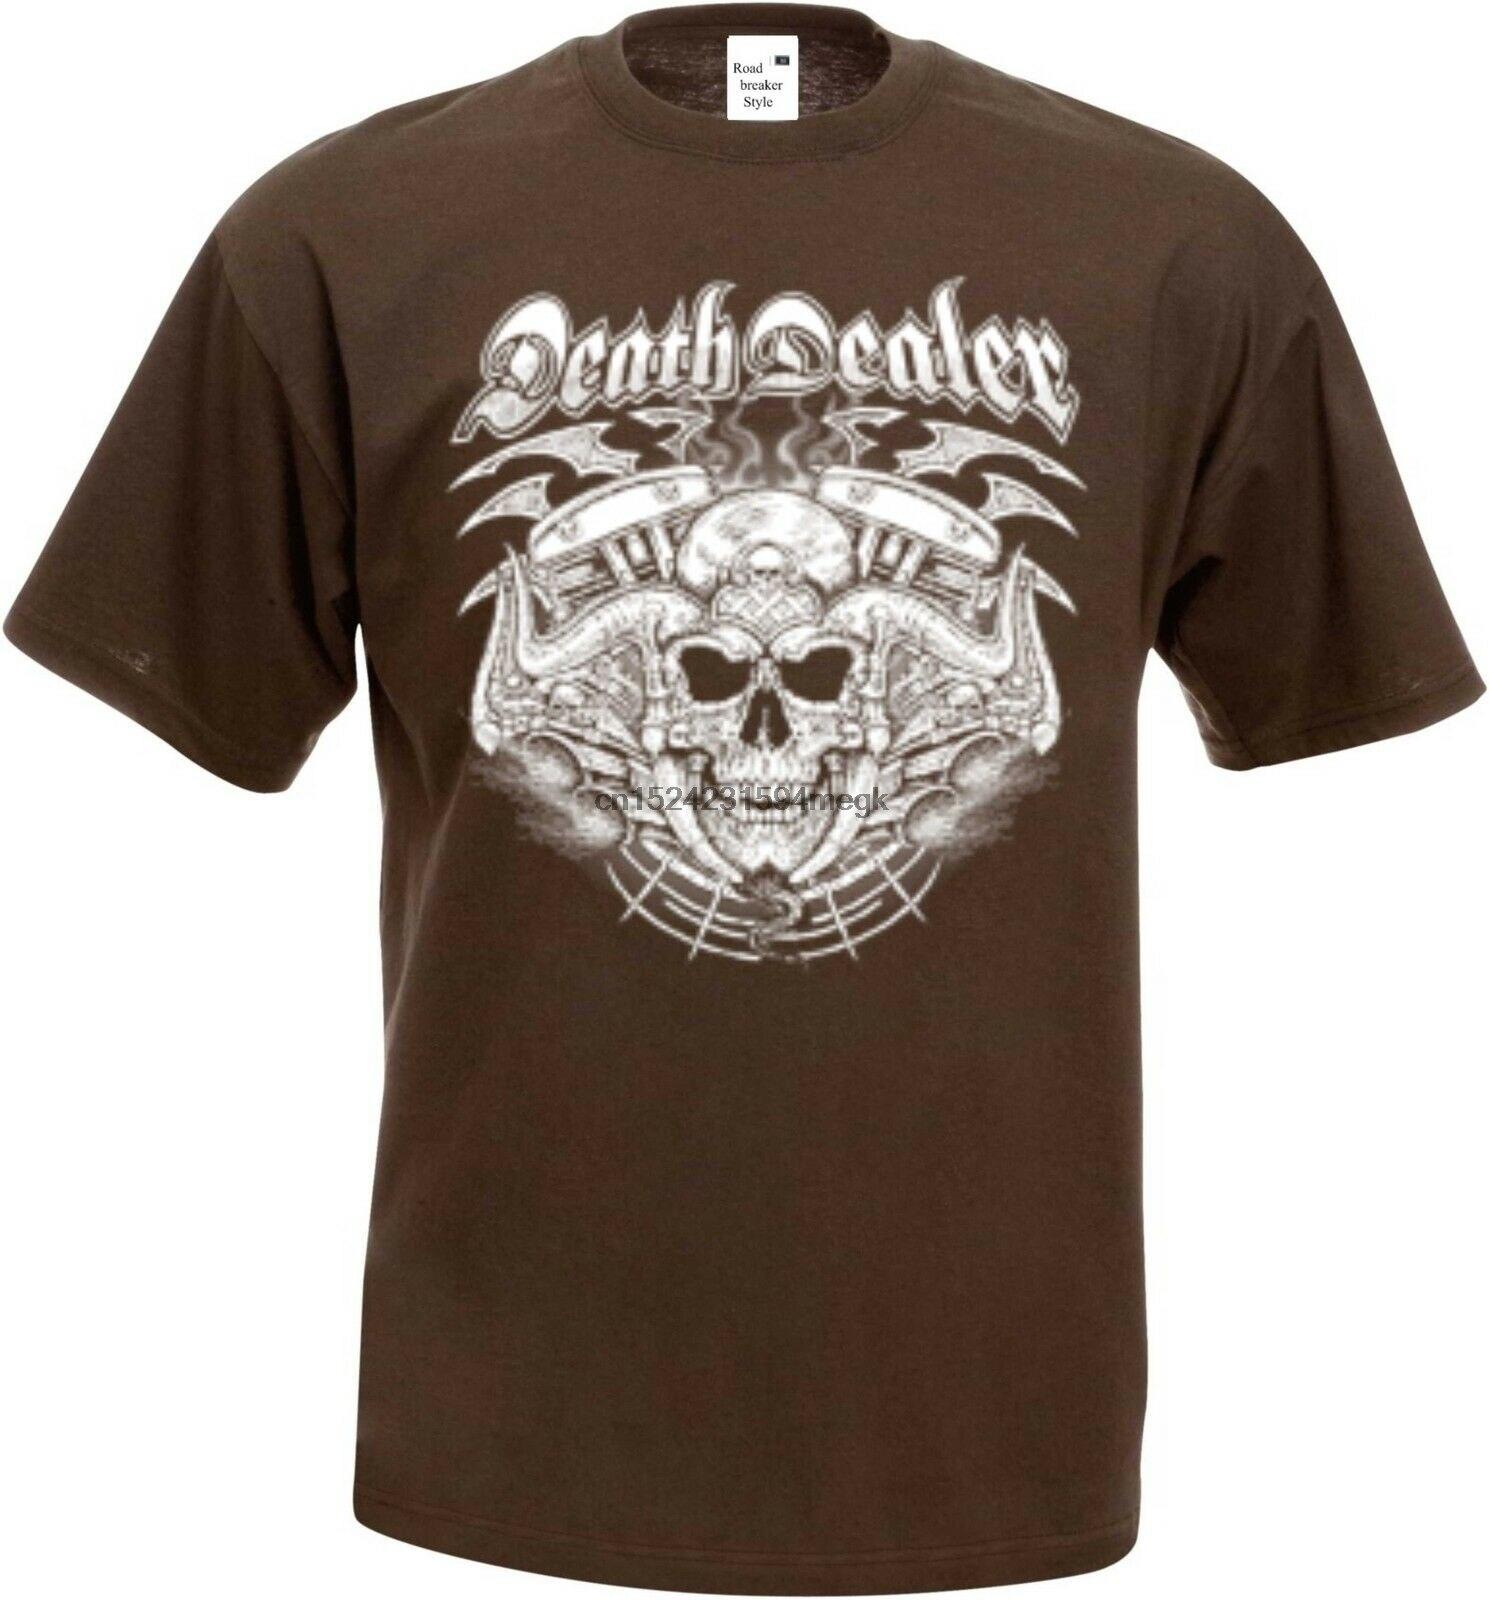 T Shirt im Graphiteton mit einem Gothik-,Biker-/&Tattoomotiv Modell Mexican Skull